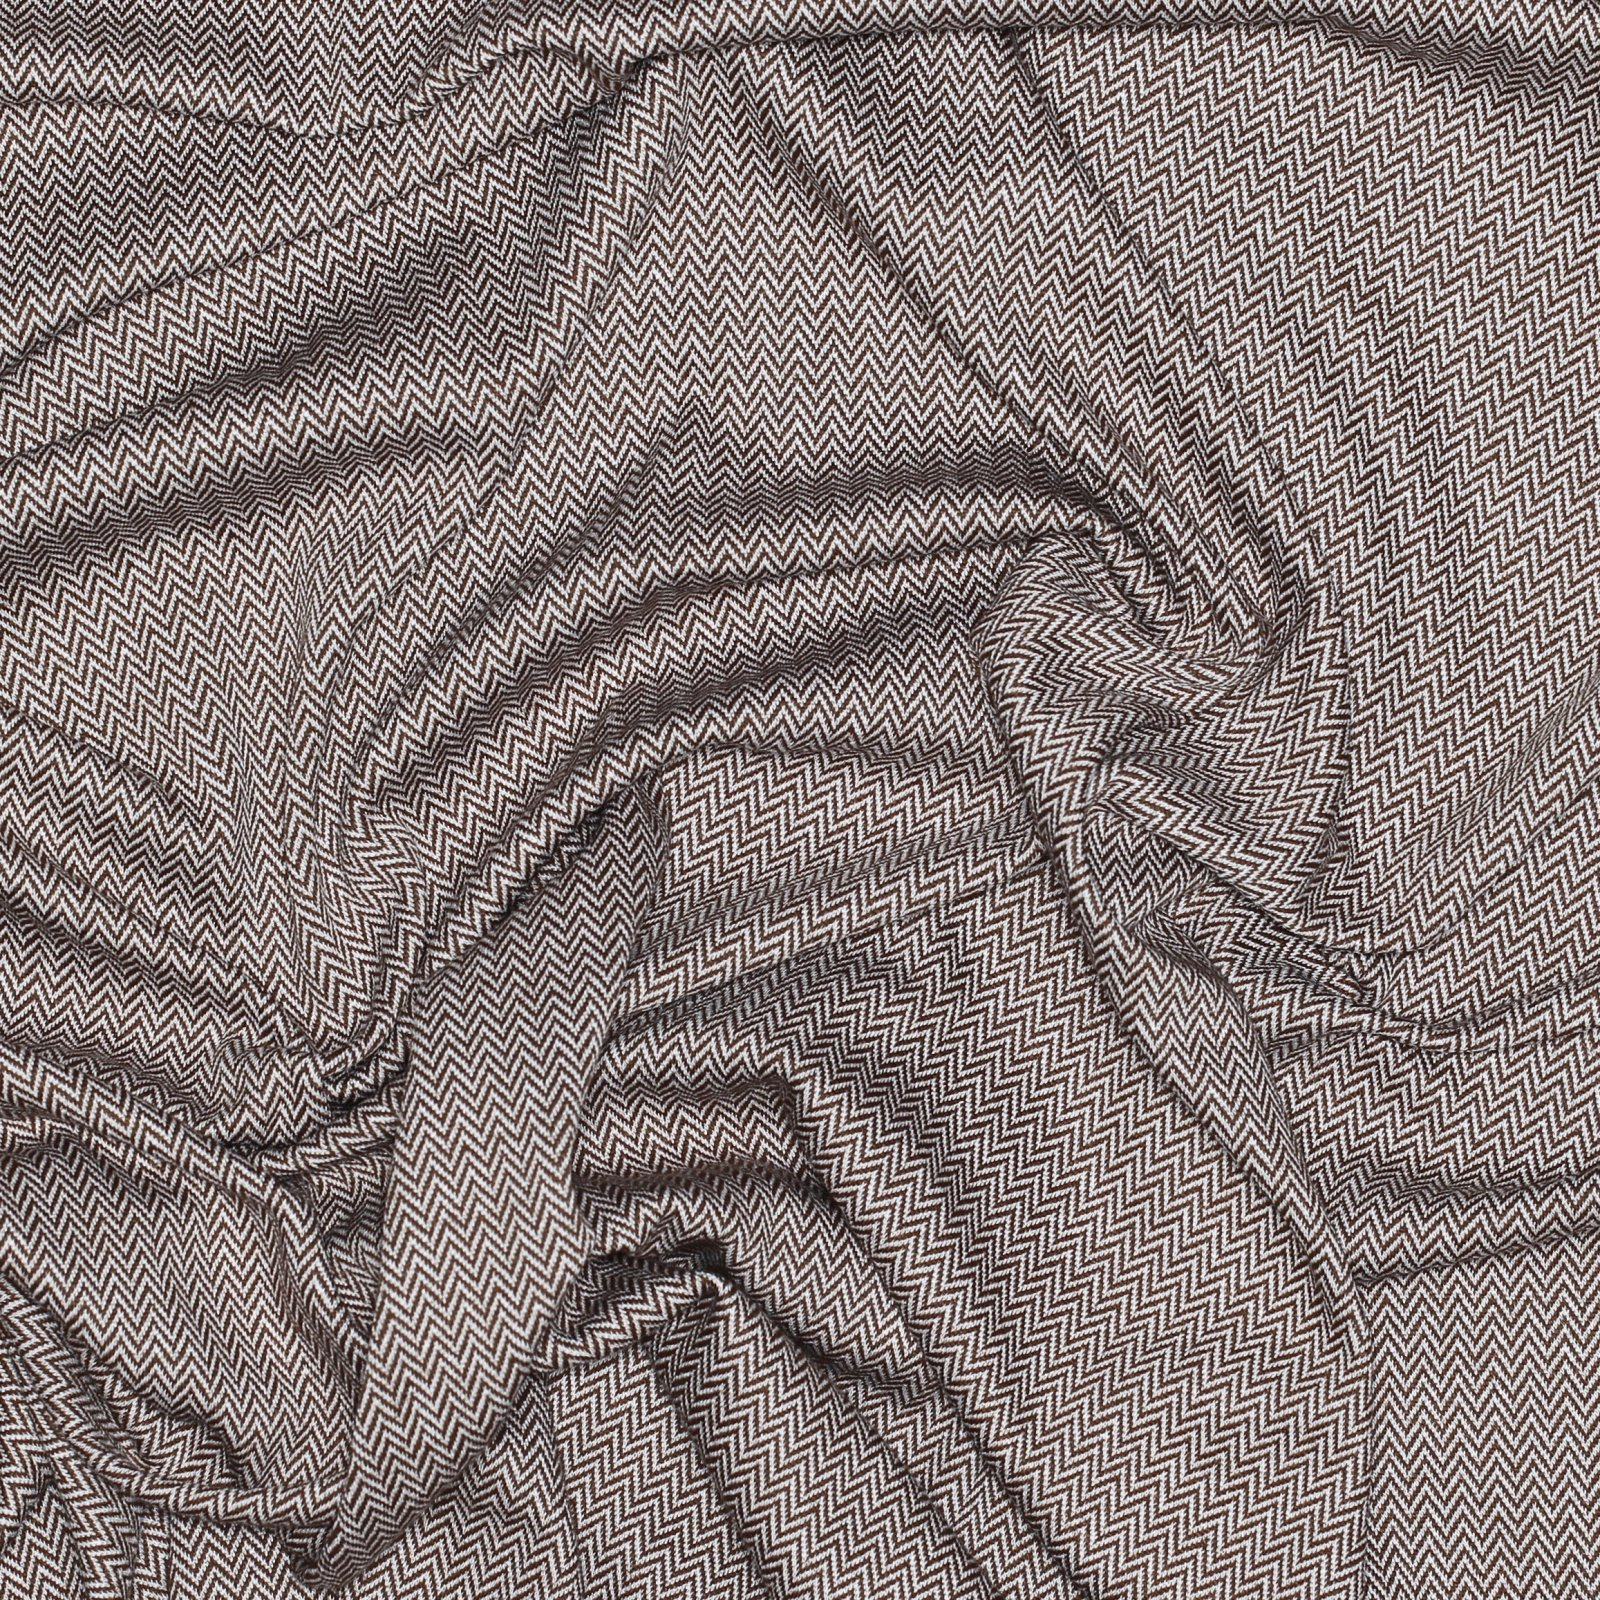 Camel/White Herringbone Knit